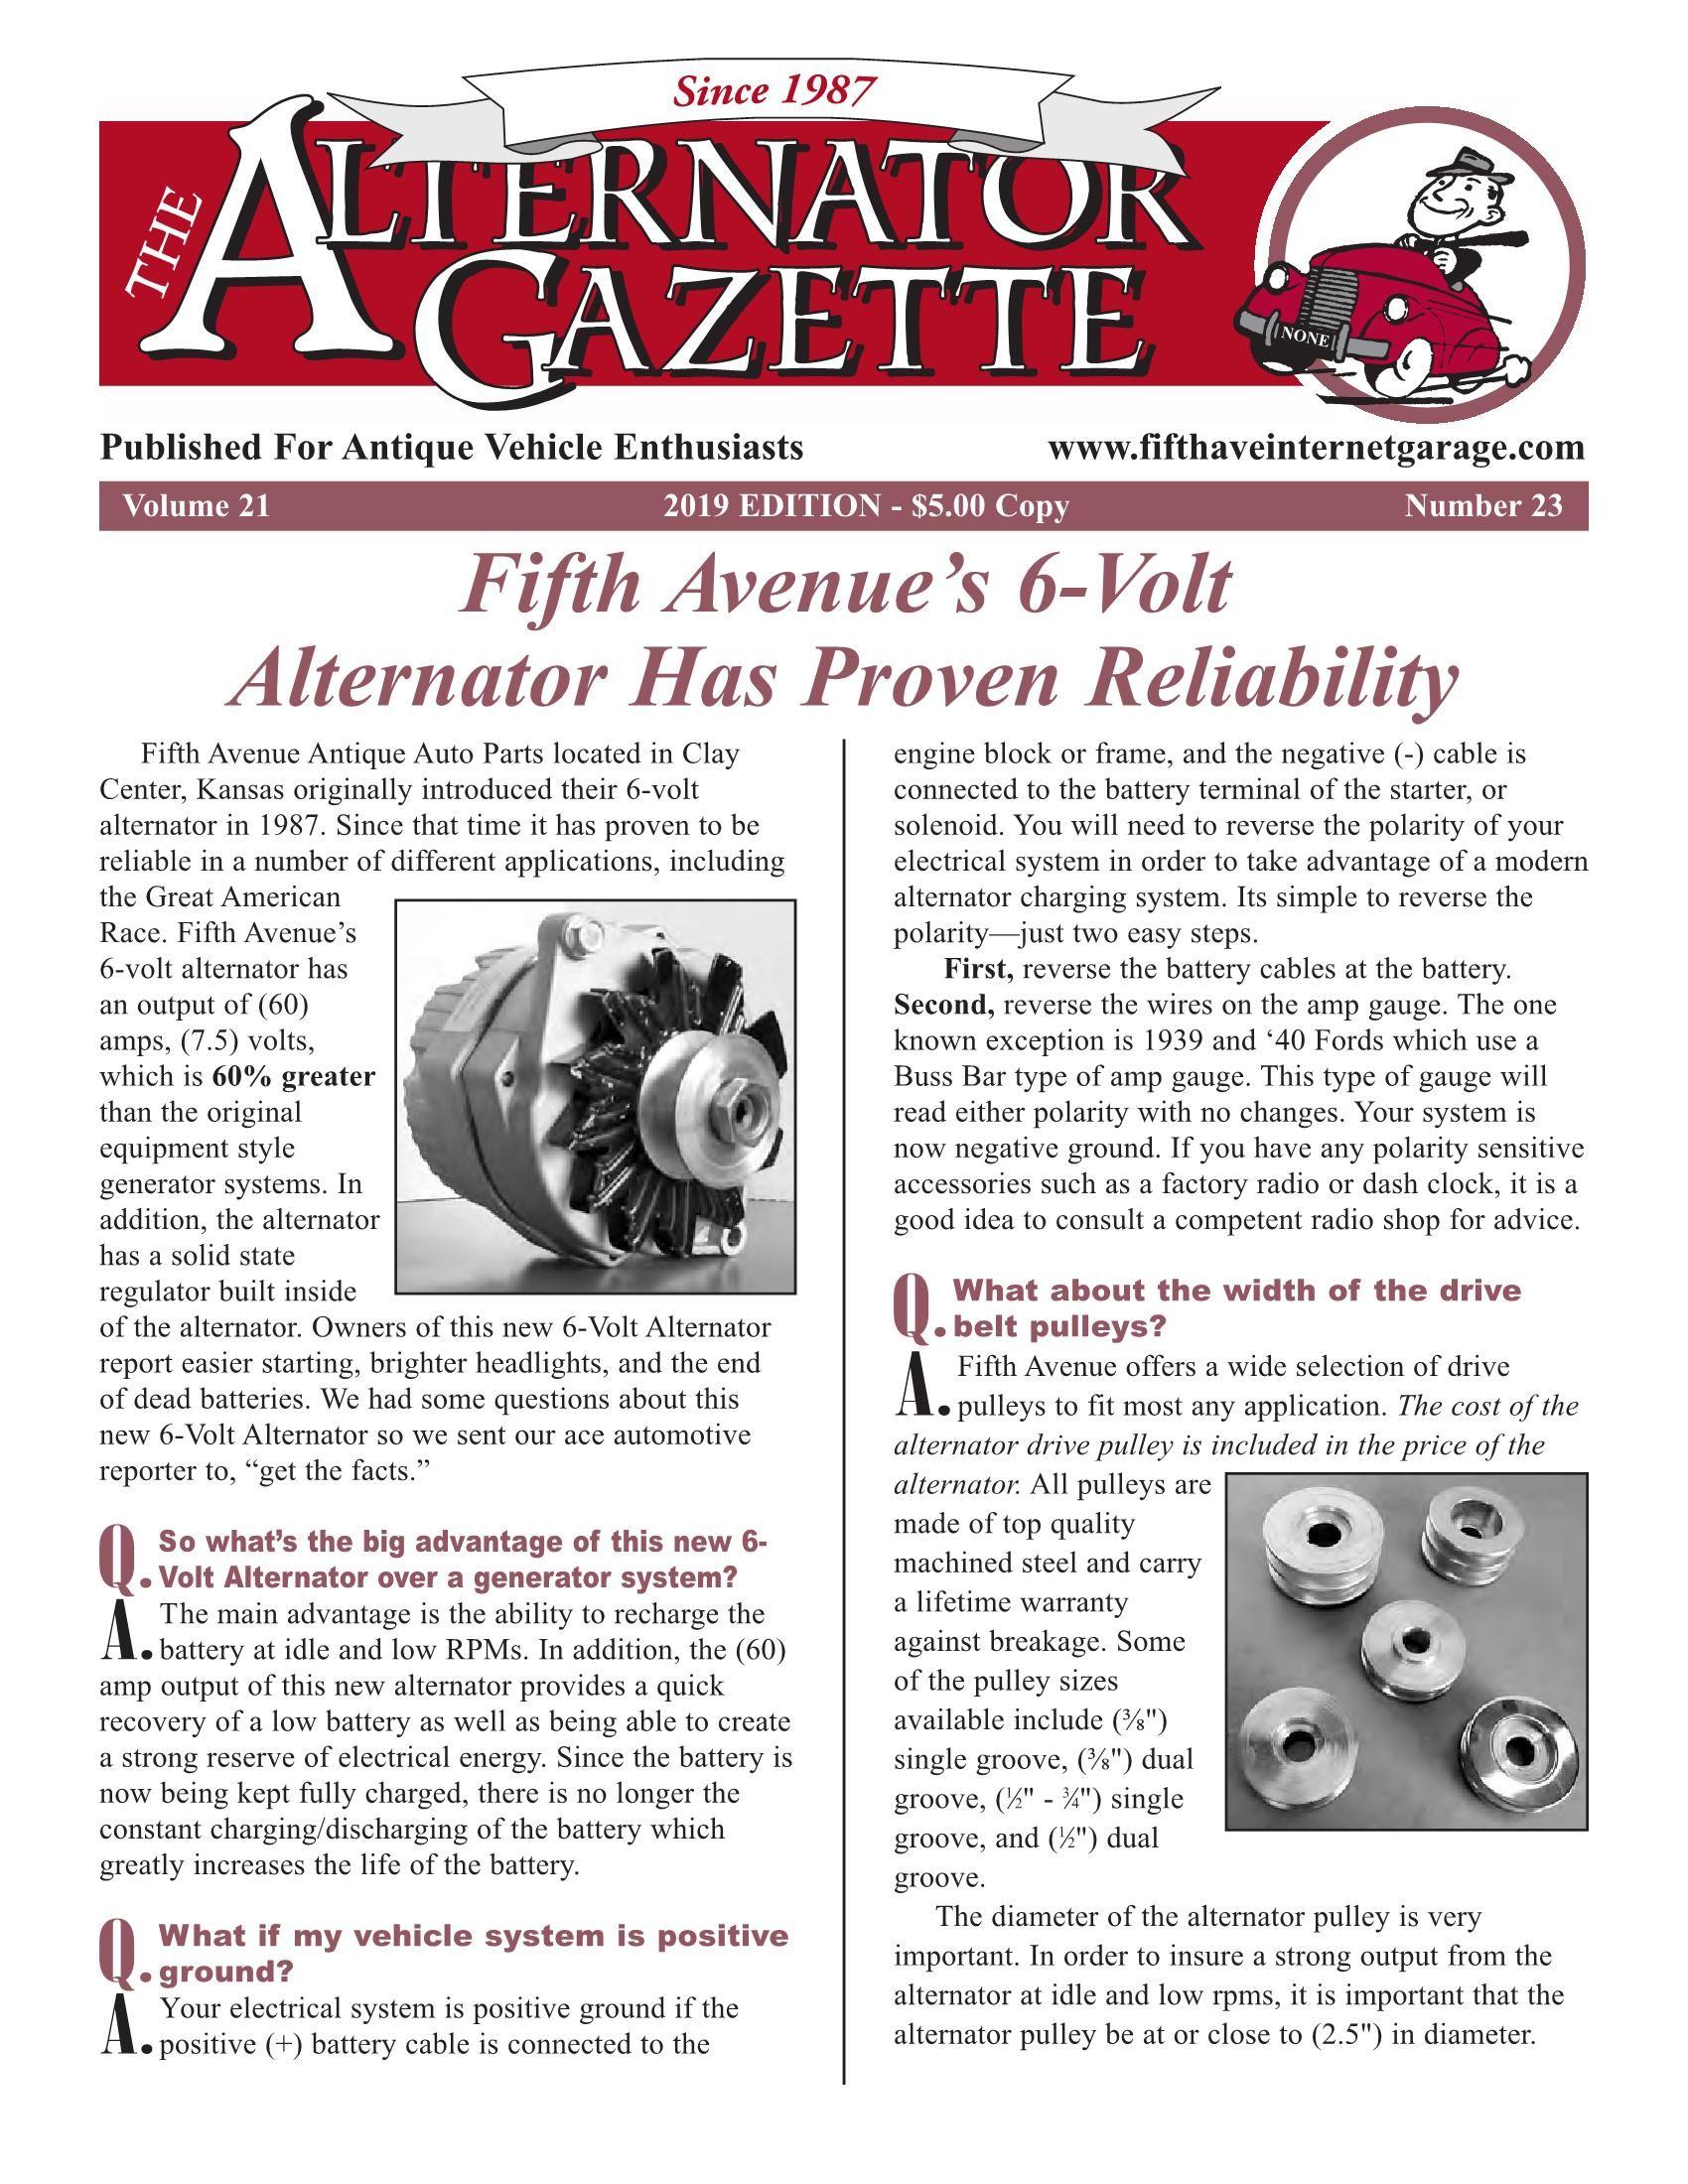 medium resolution of alternator gazette